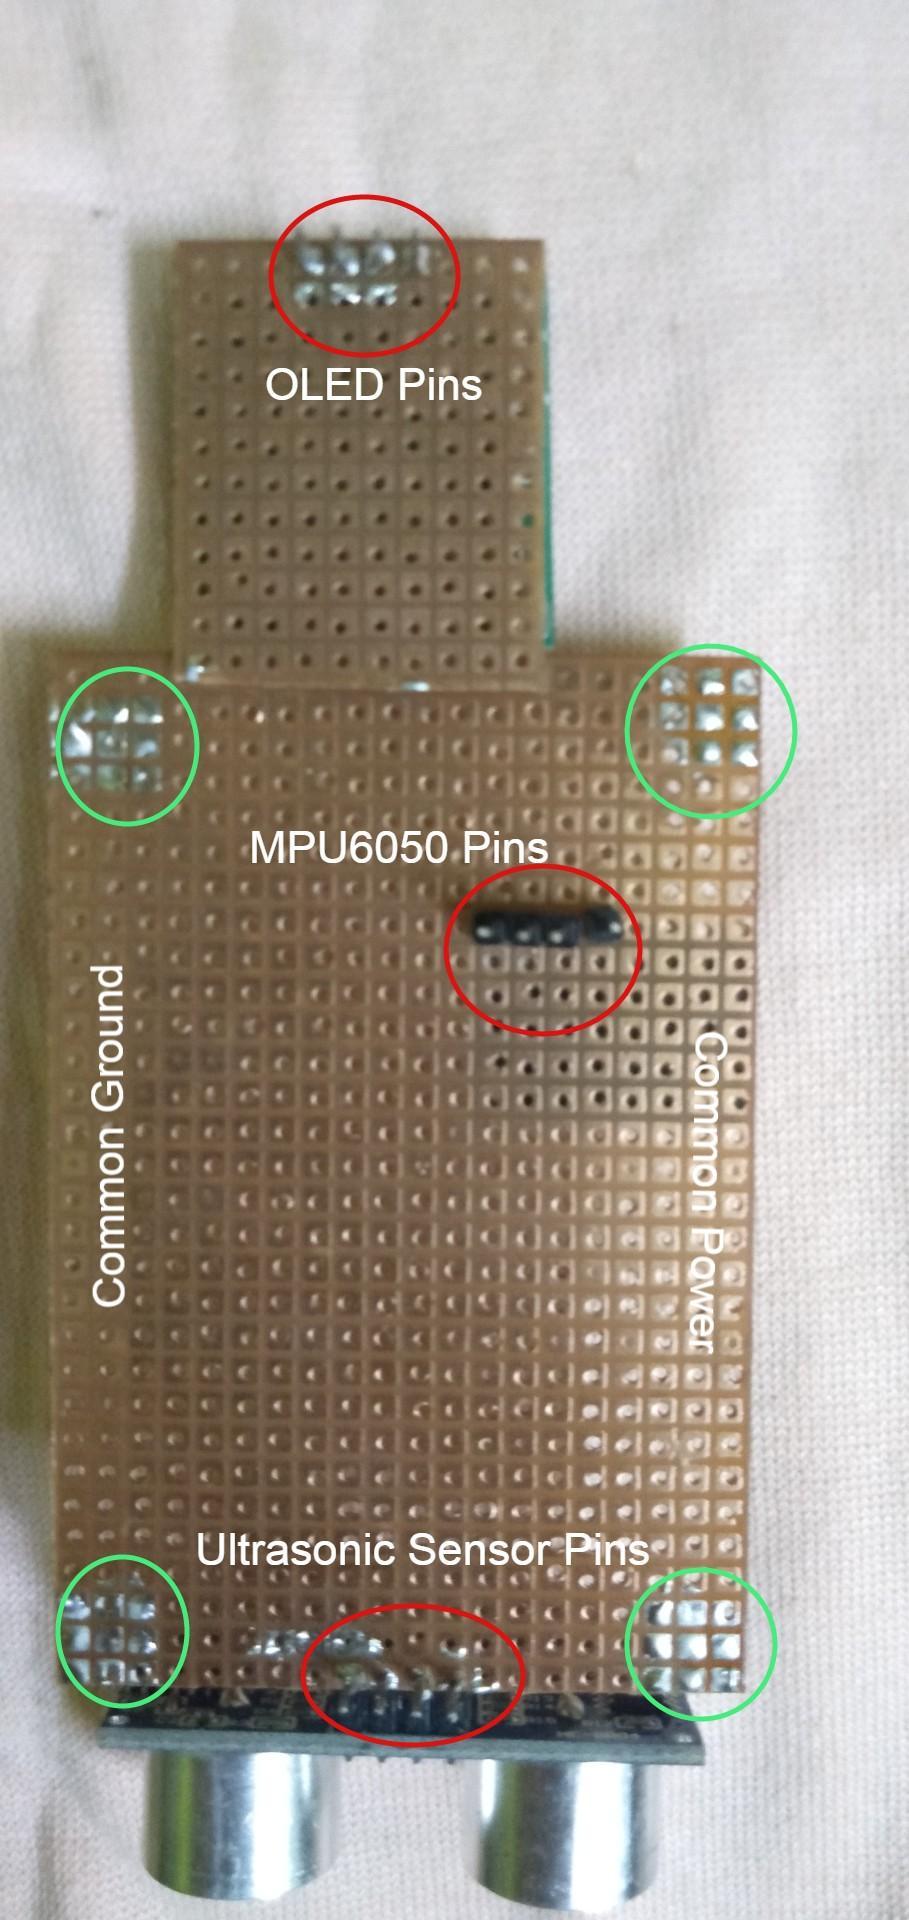 Hardware: PerfBoard Assembly (MPU6050, Ultrasonic Sensor and OLED Screen)